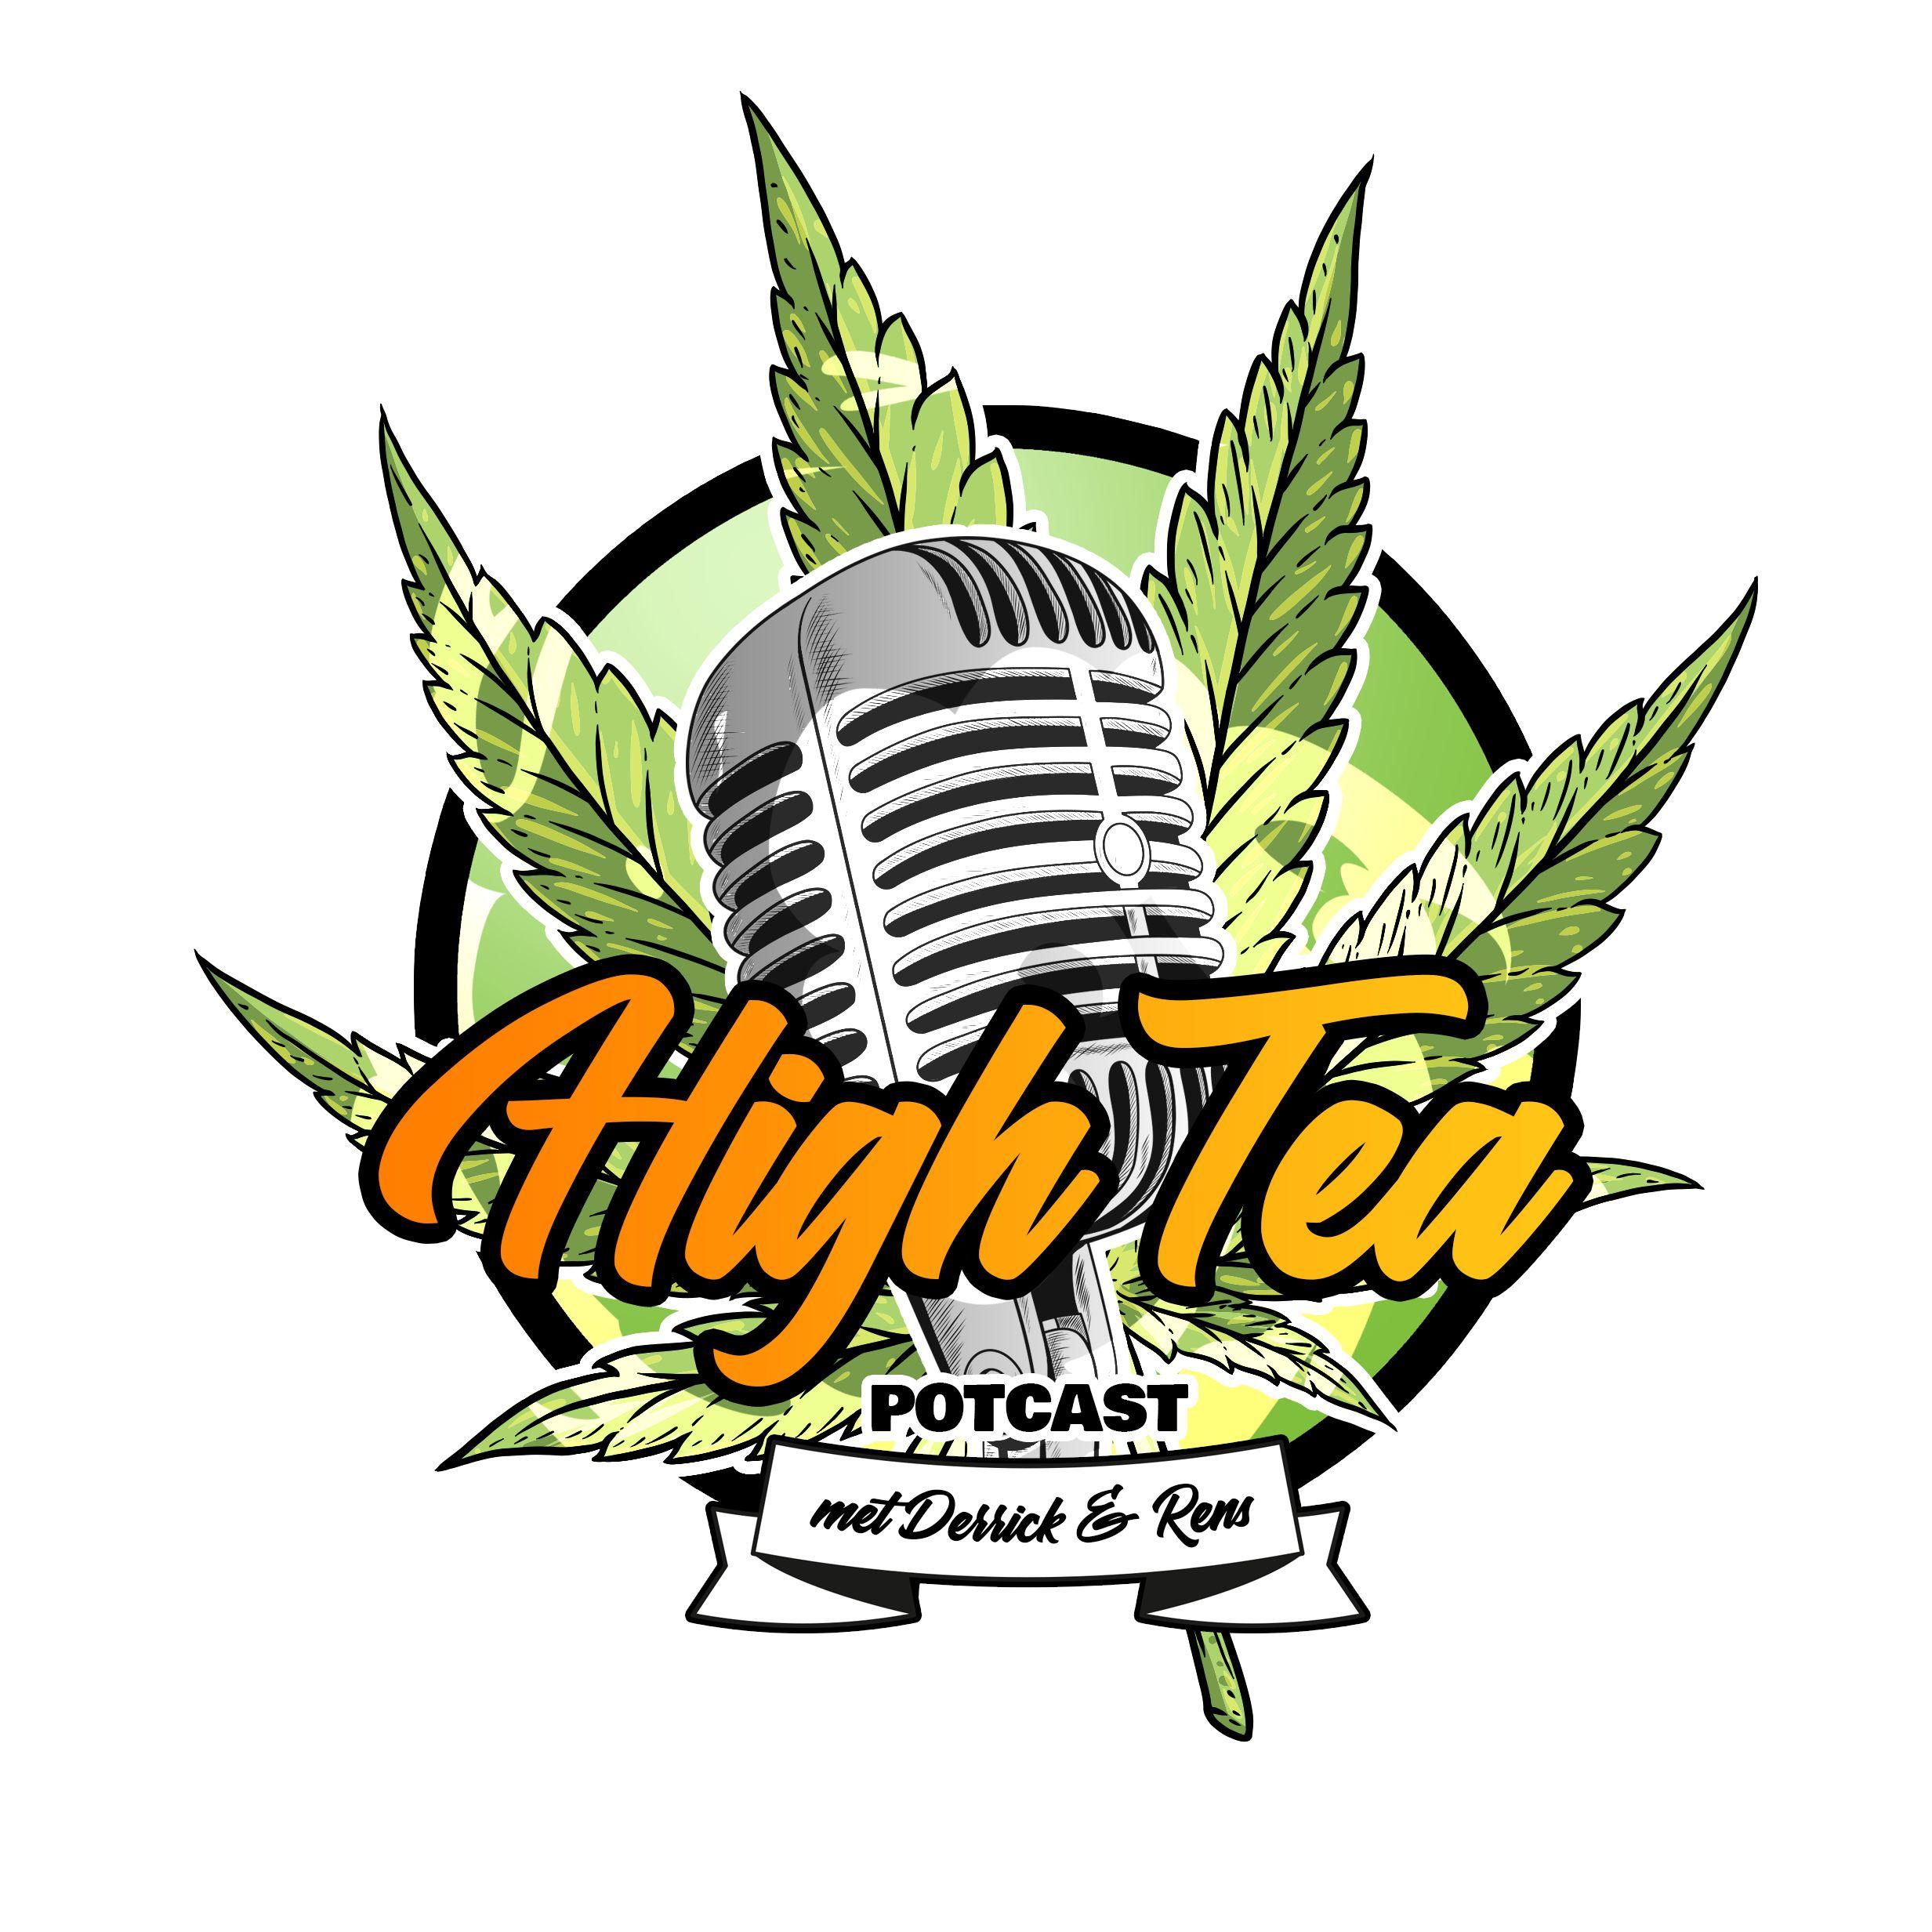 High Tea Potcast logo